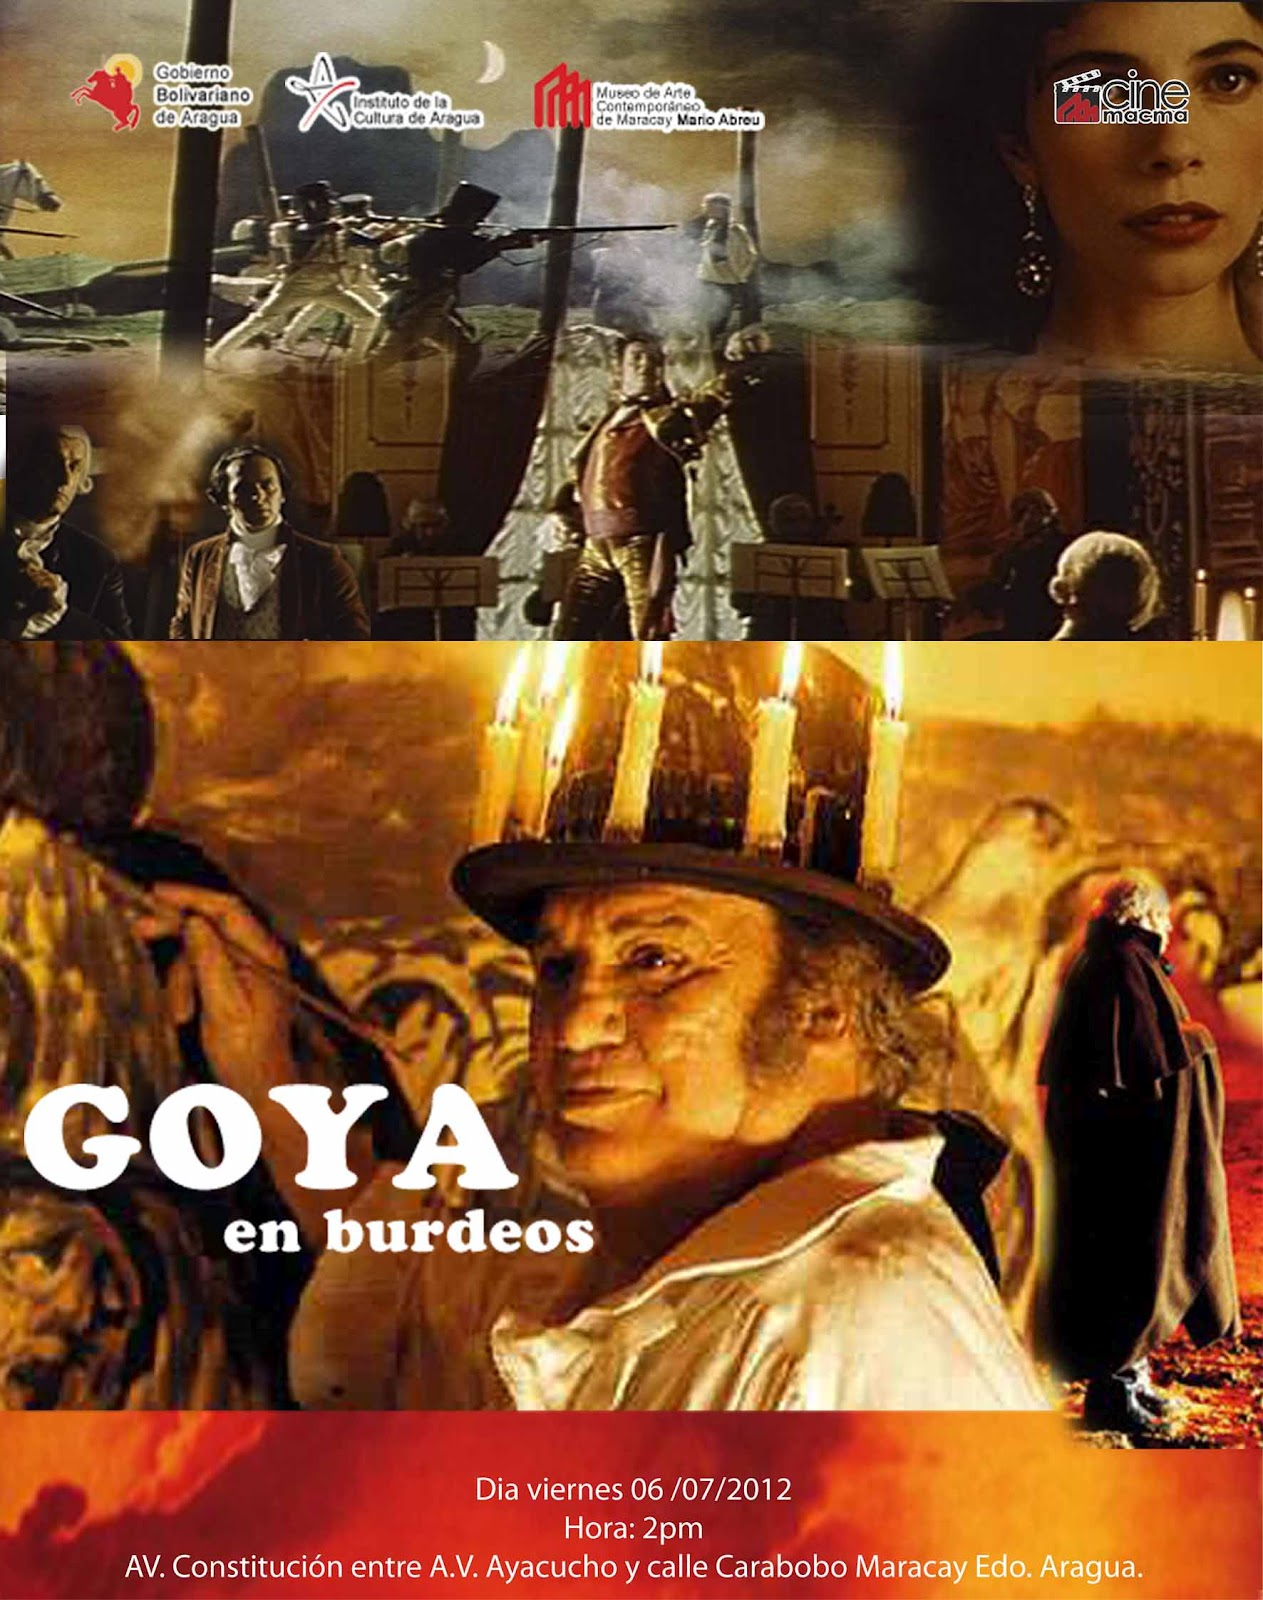 http://4.bp.blogspot.com/-BEJwK5Z6pvI/T_SzkEPVPQI/AAAAAAAABO0/-hHYhjalbVs/s1600/cine+goya+en+burdeos+baja.jpg